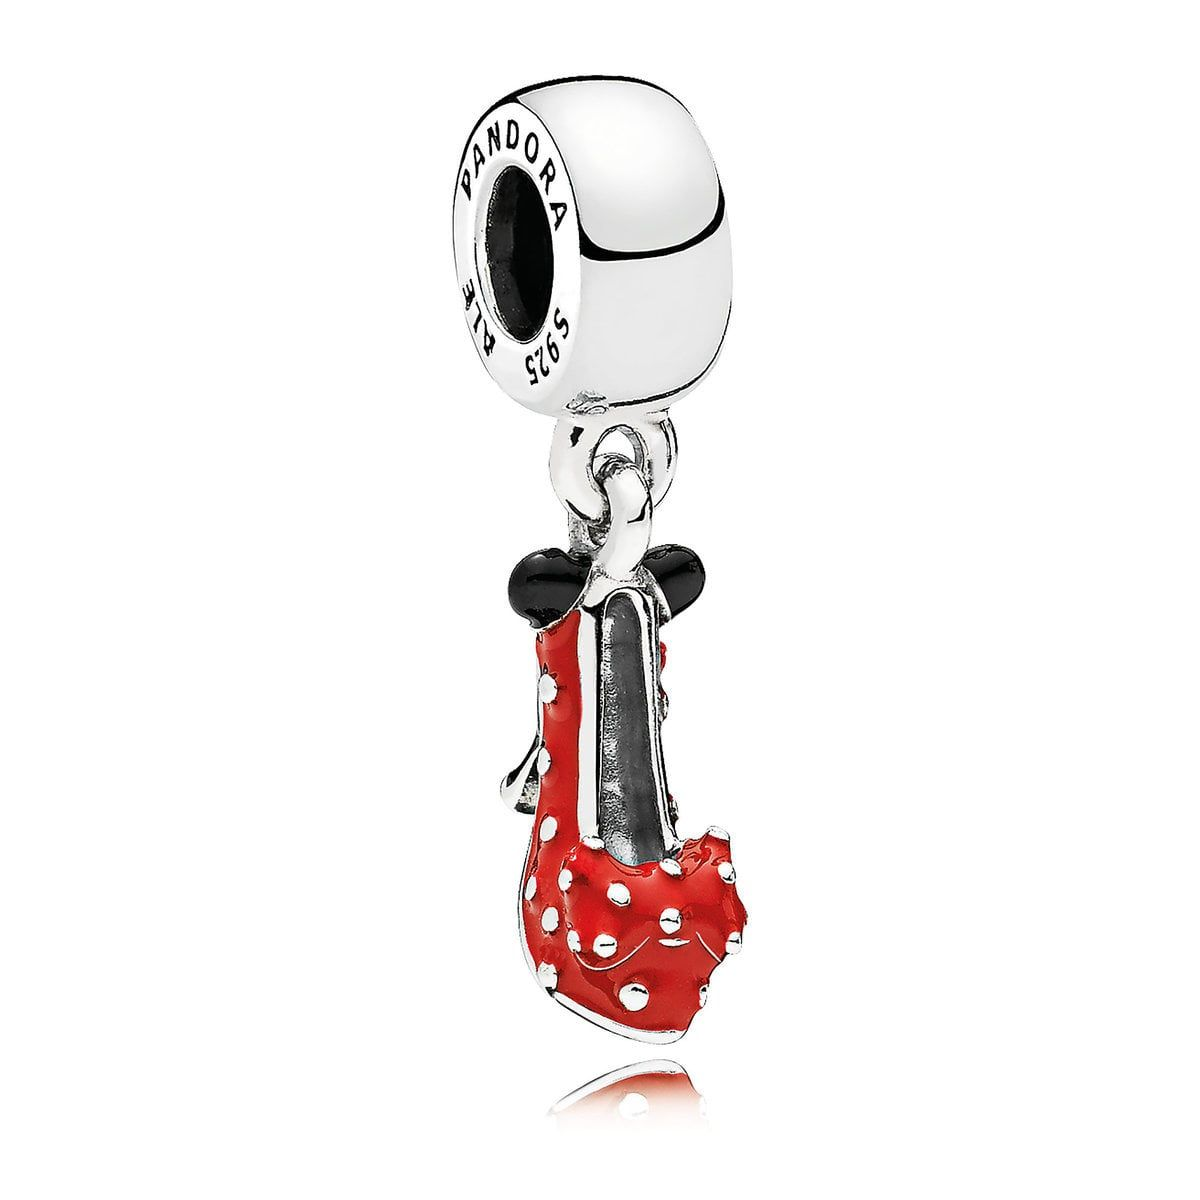 Who Sells Pandora Jewelry: Minnie Mouse Shoe Charm By Pandora Jewelry